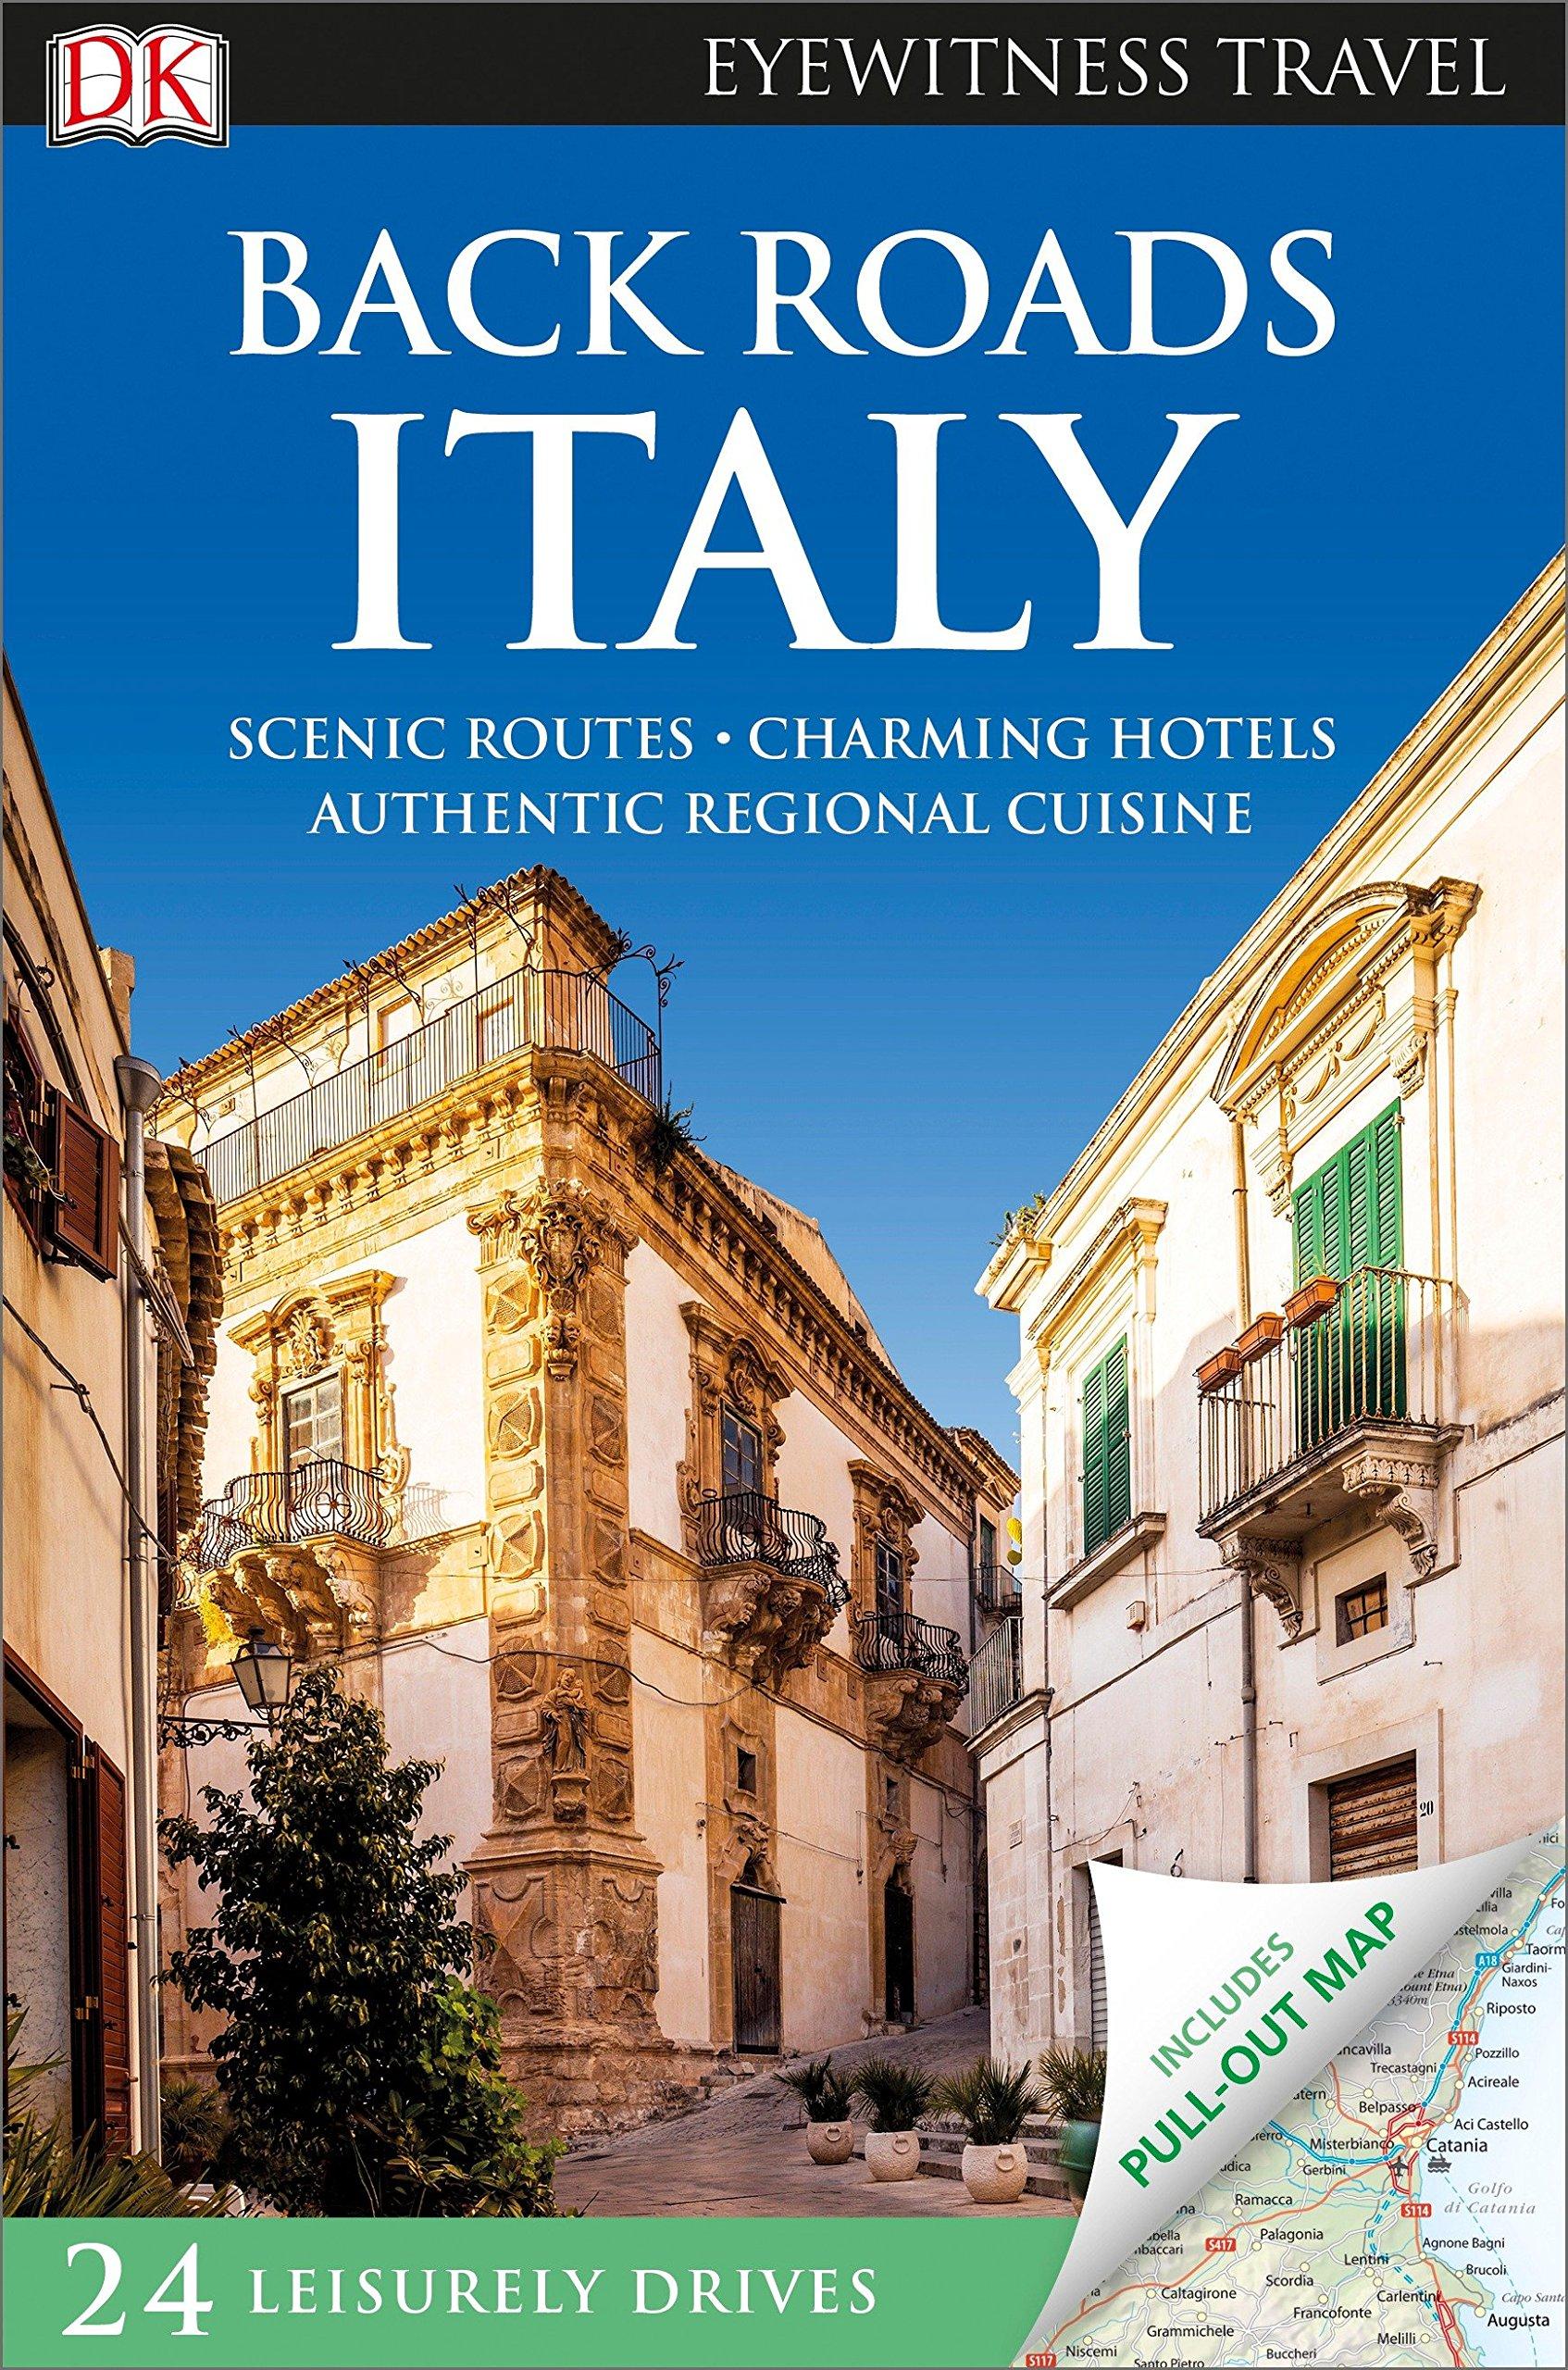 Back Roads Italy (DK Eyewitness Travel Guide): DK Travel: 9781465439642:  Amazon.com: Books